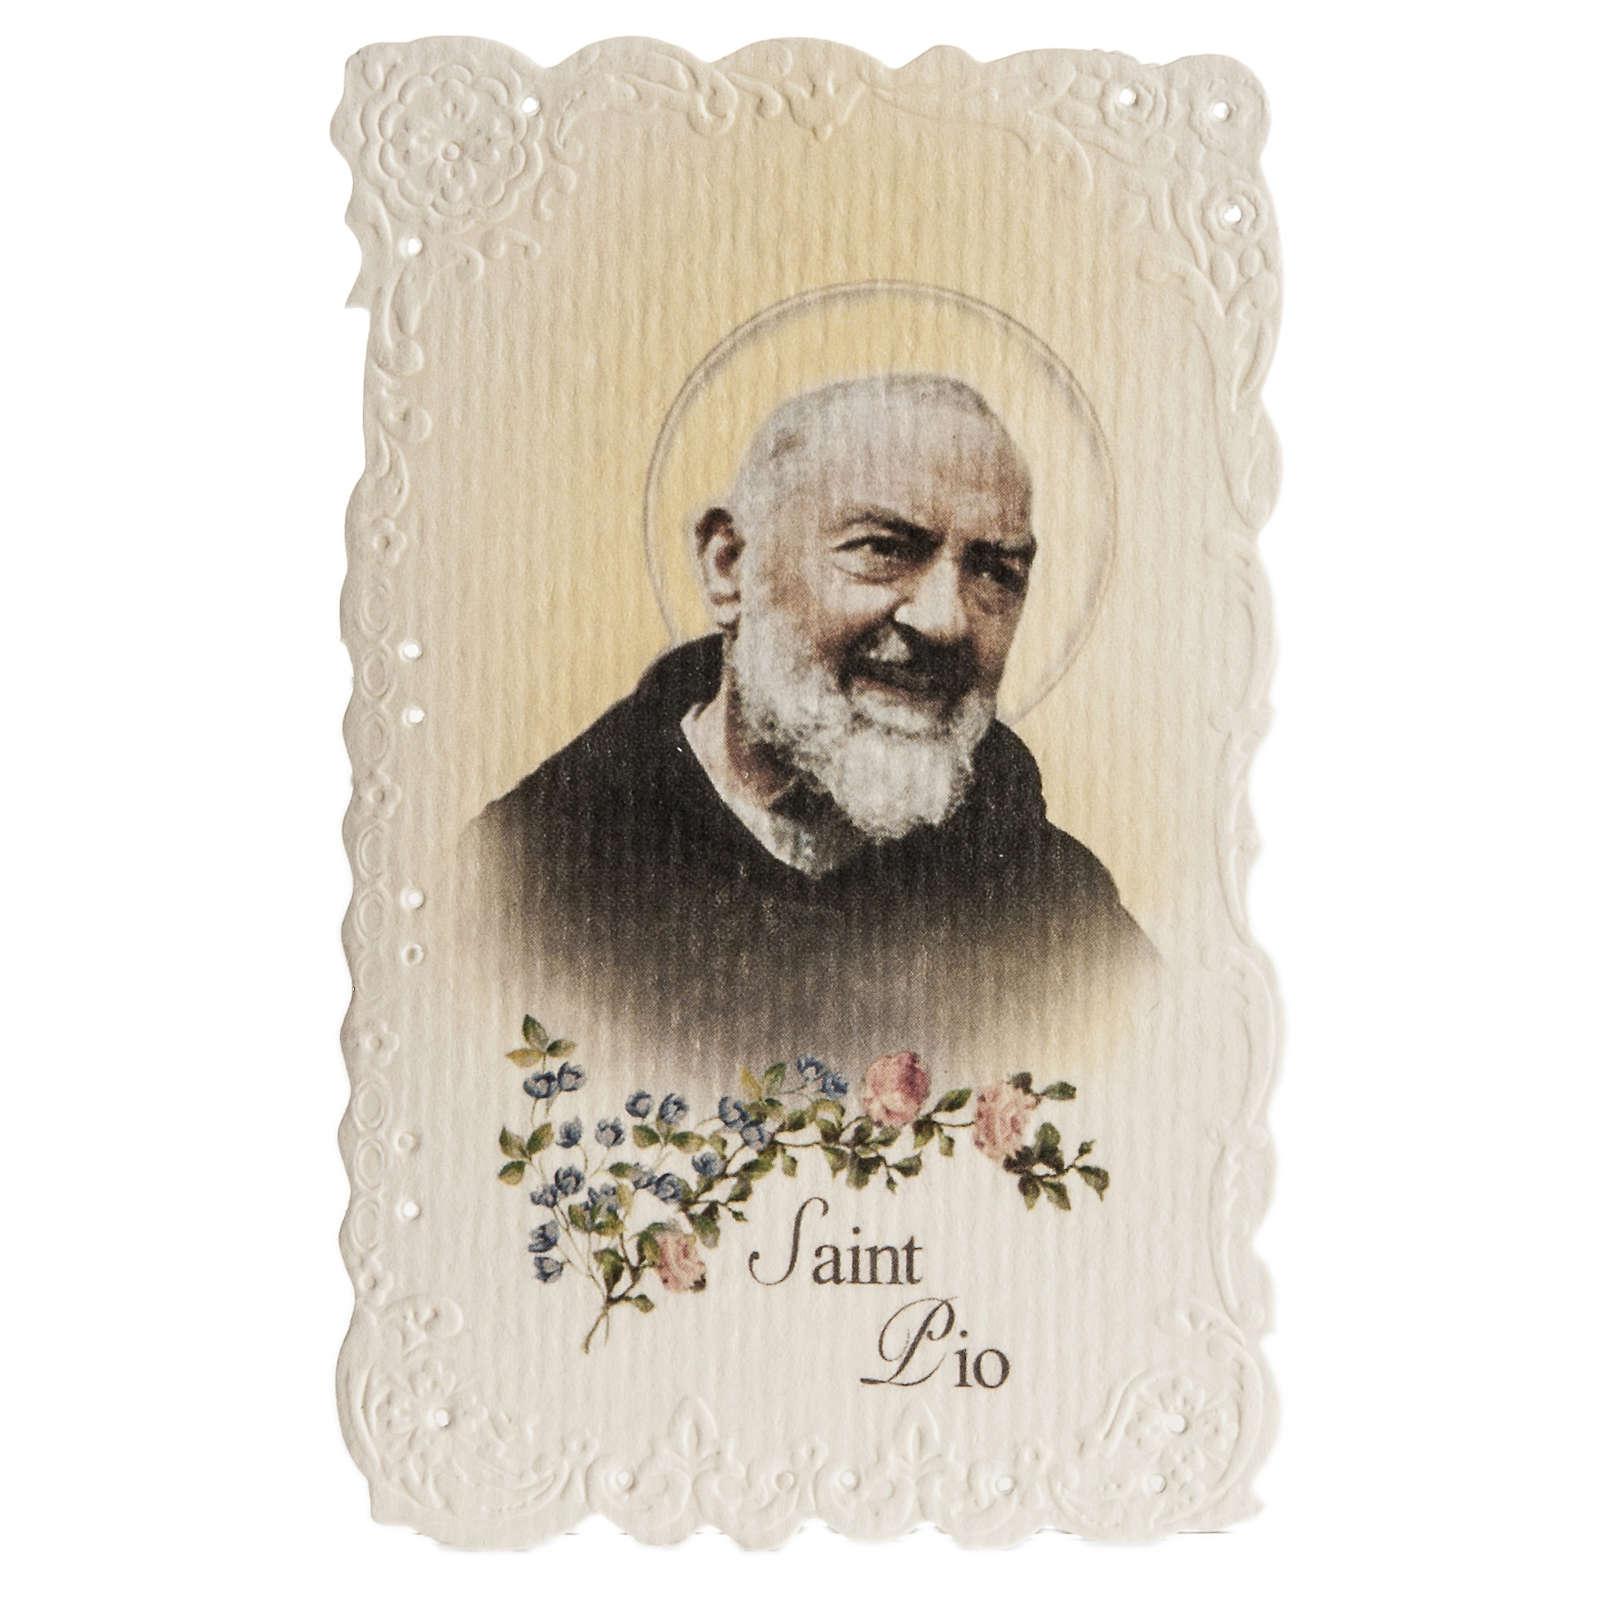 Image pieuse Saint Pio et prière ANGLAIS 4